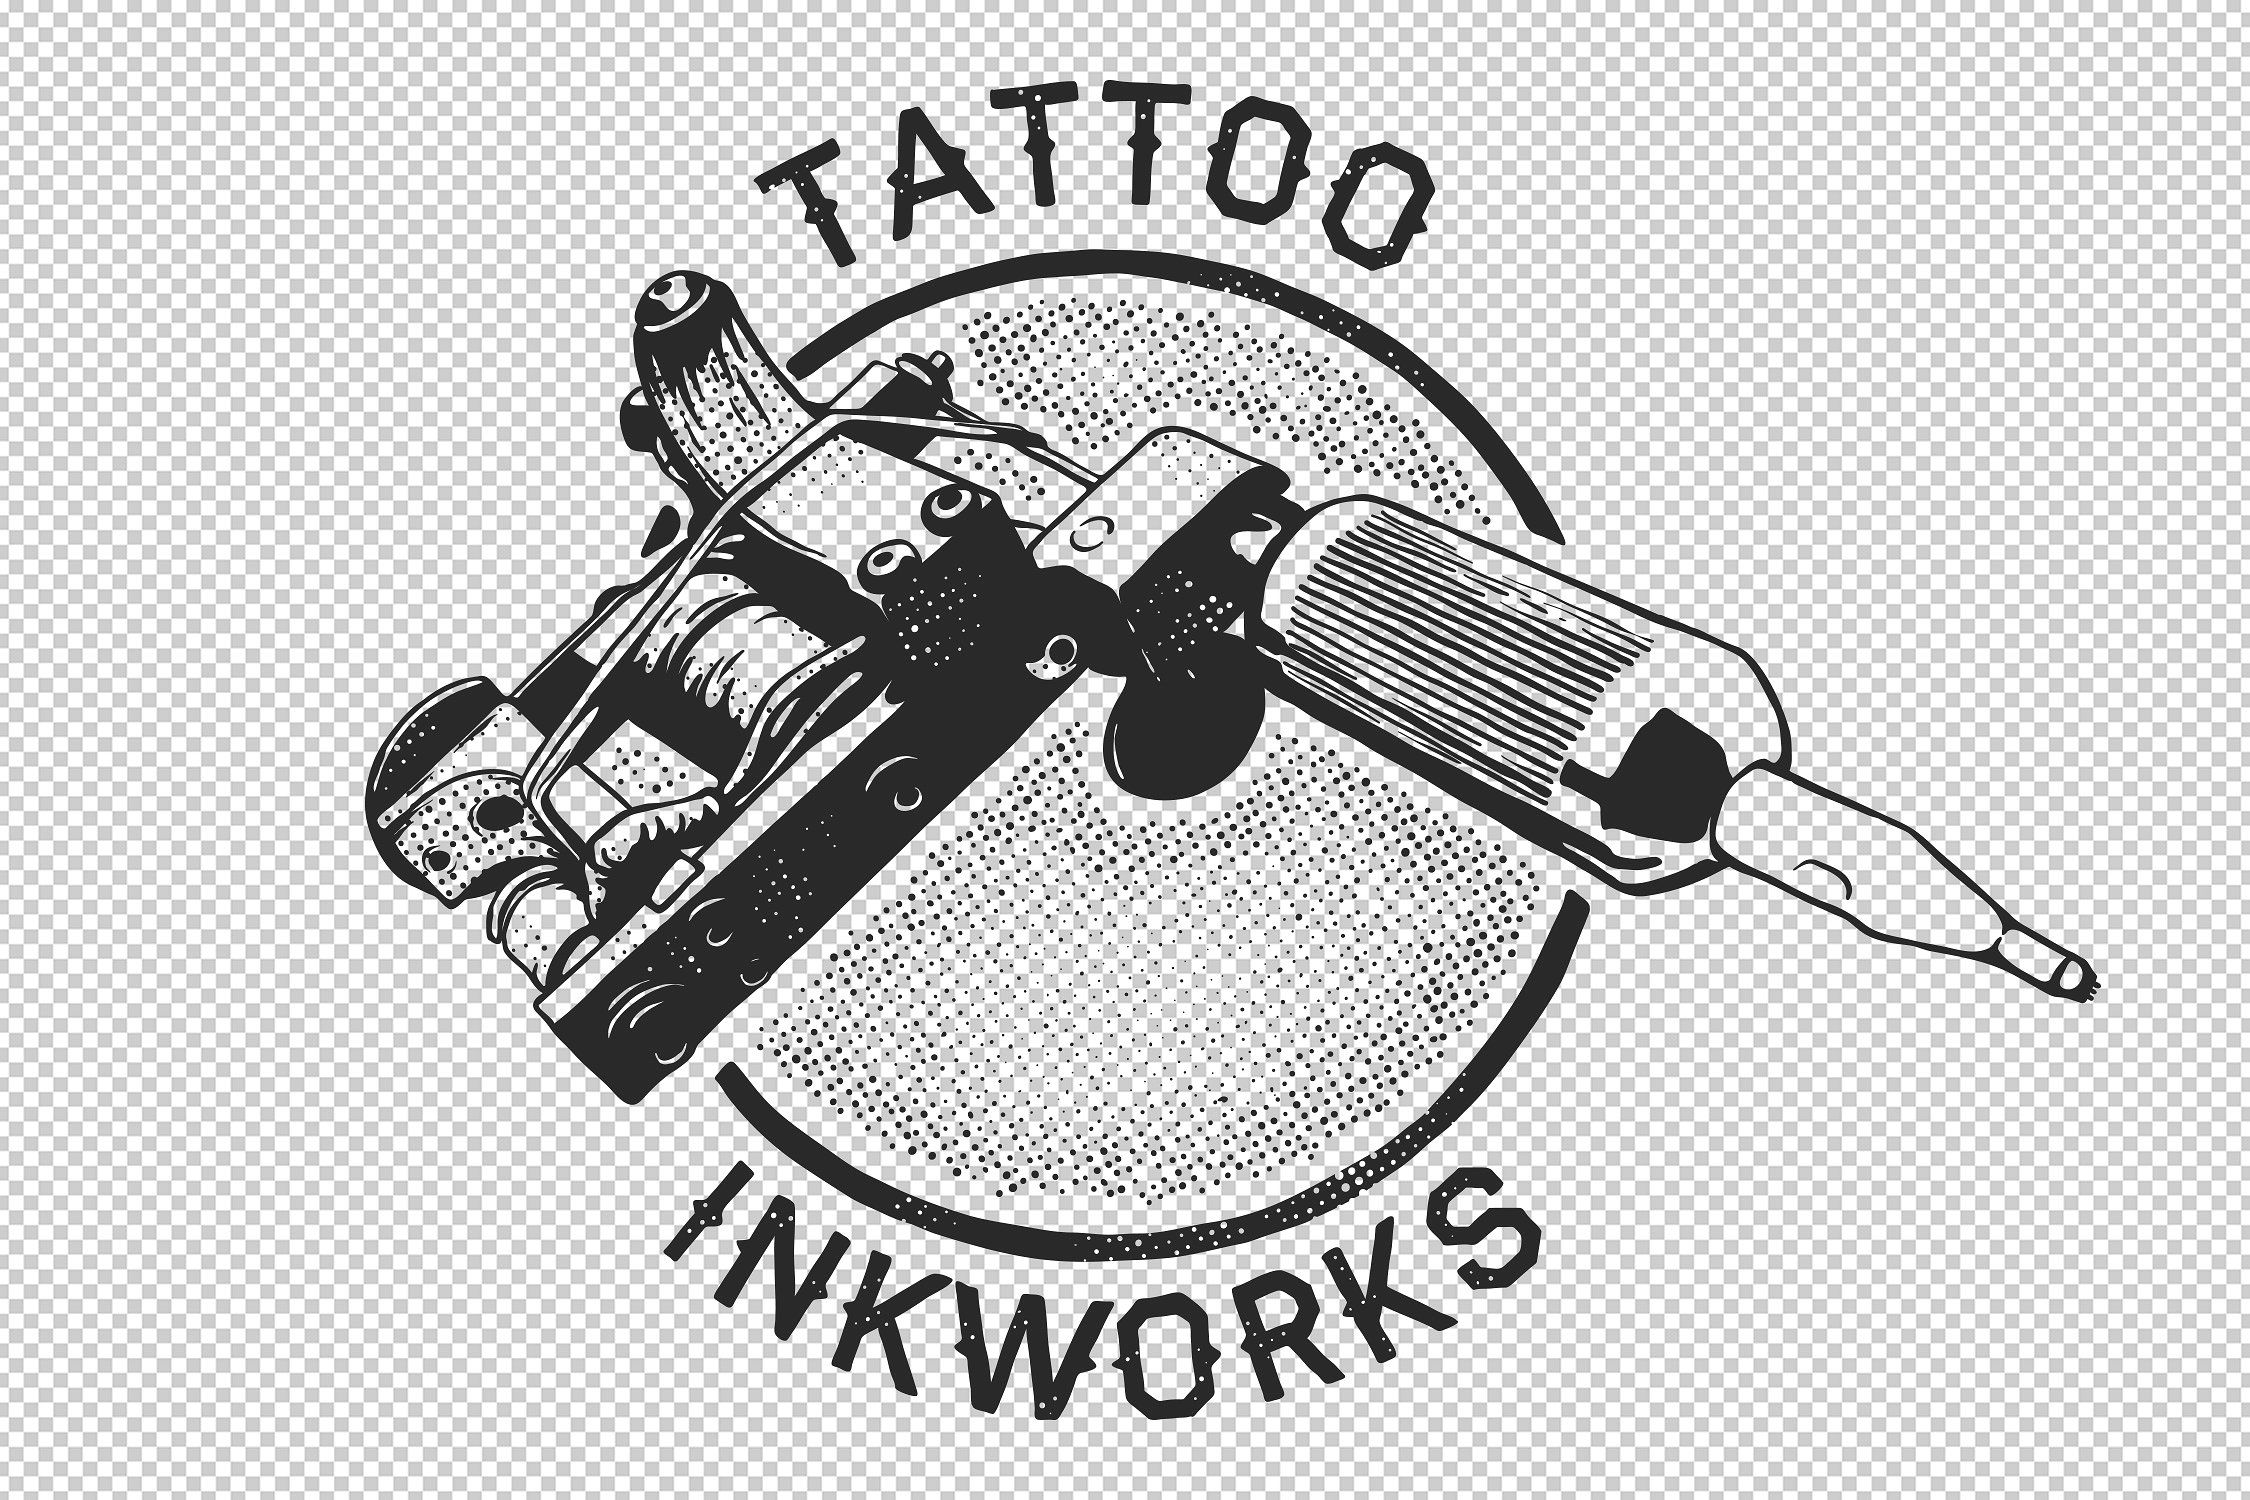 Machine Tattoo 2 Royalty Free Vector Image Vectorstock Affiliate Royalty Tattoo Machine Fr Tattoo Machine Tattoo Machine Art Tattoo Machine Design